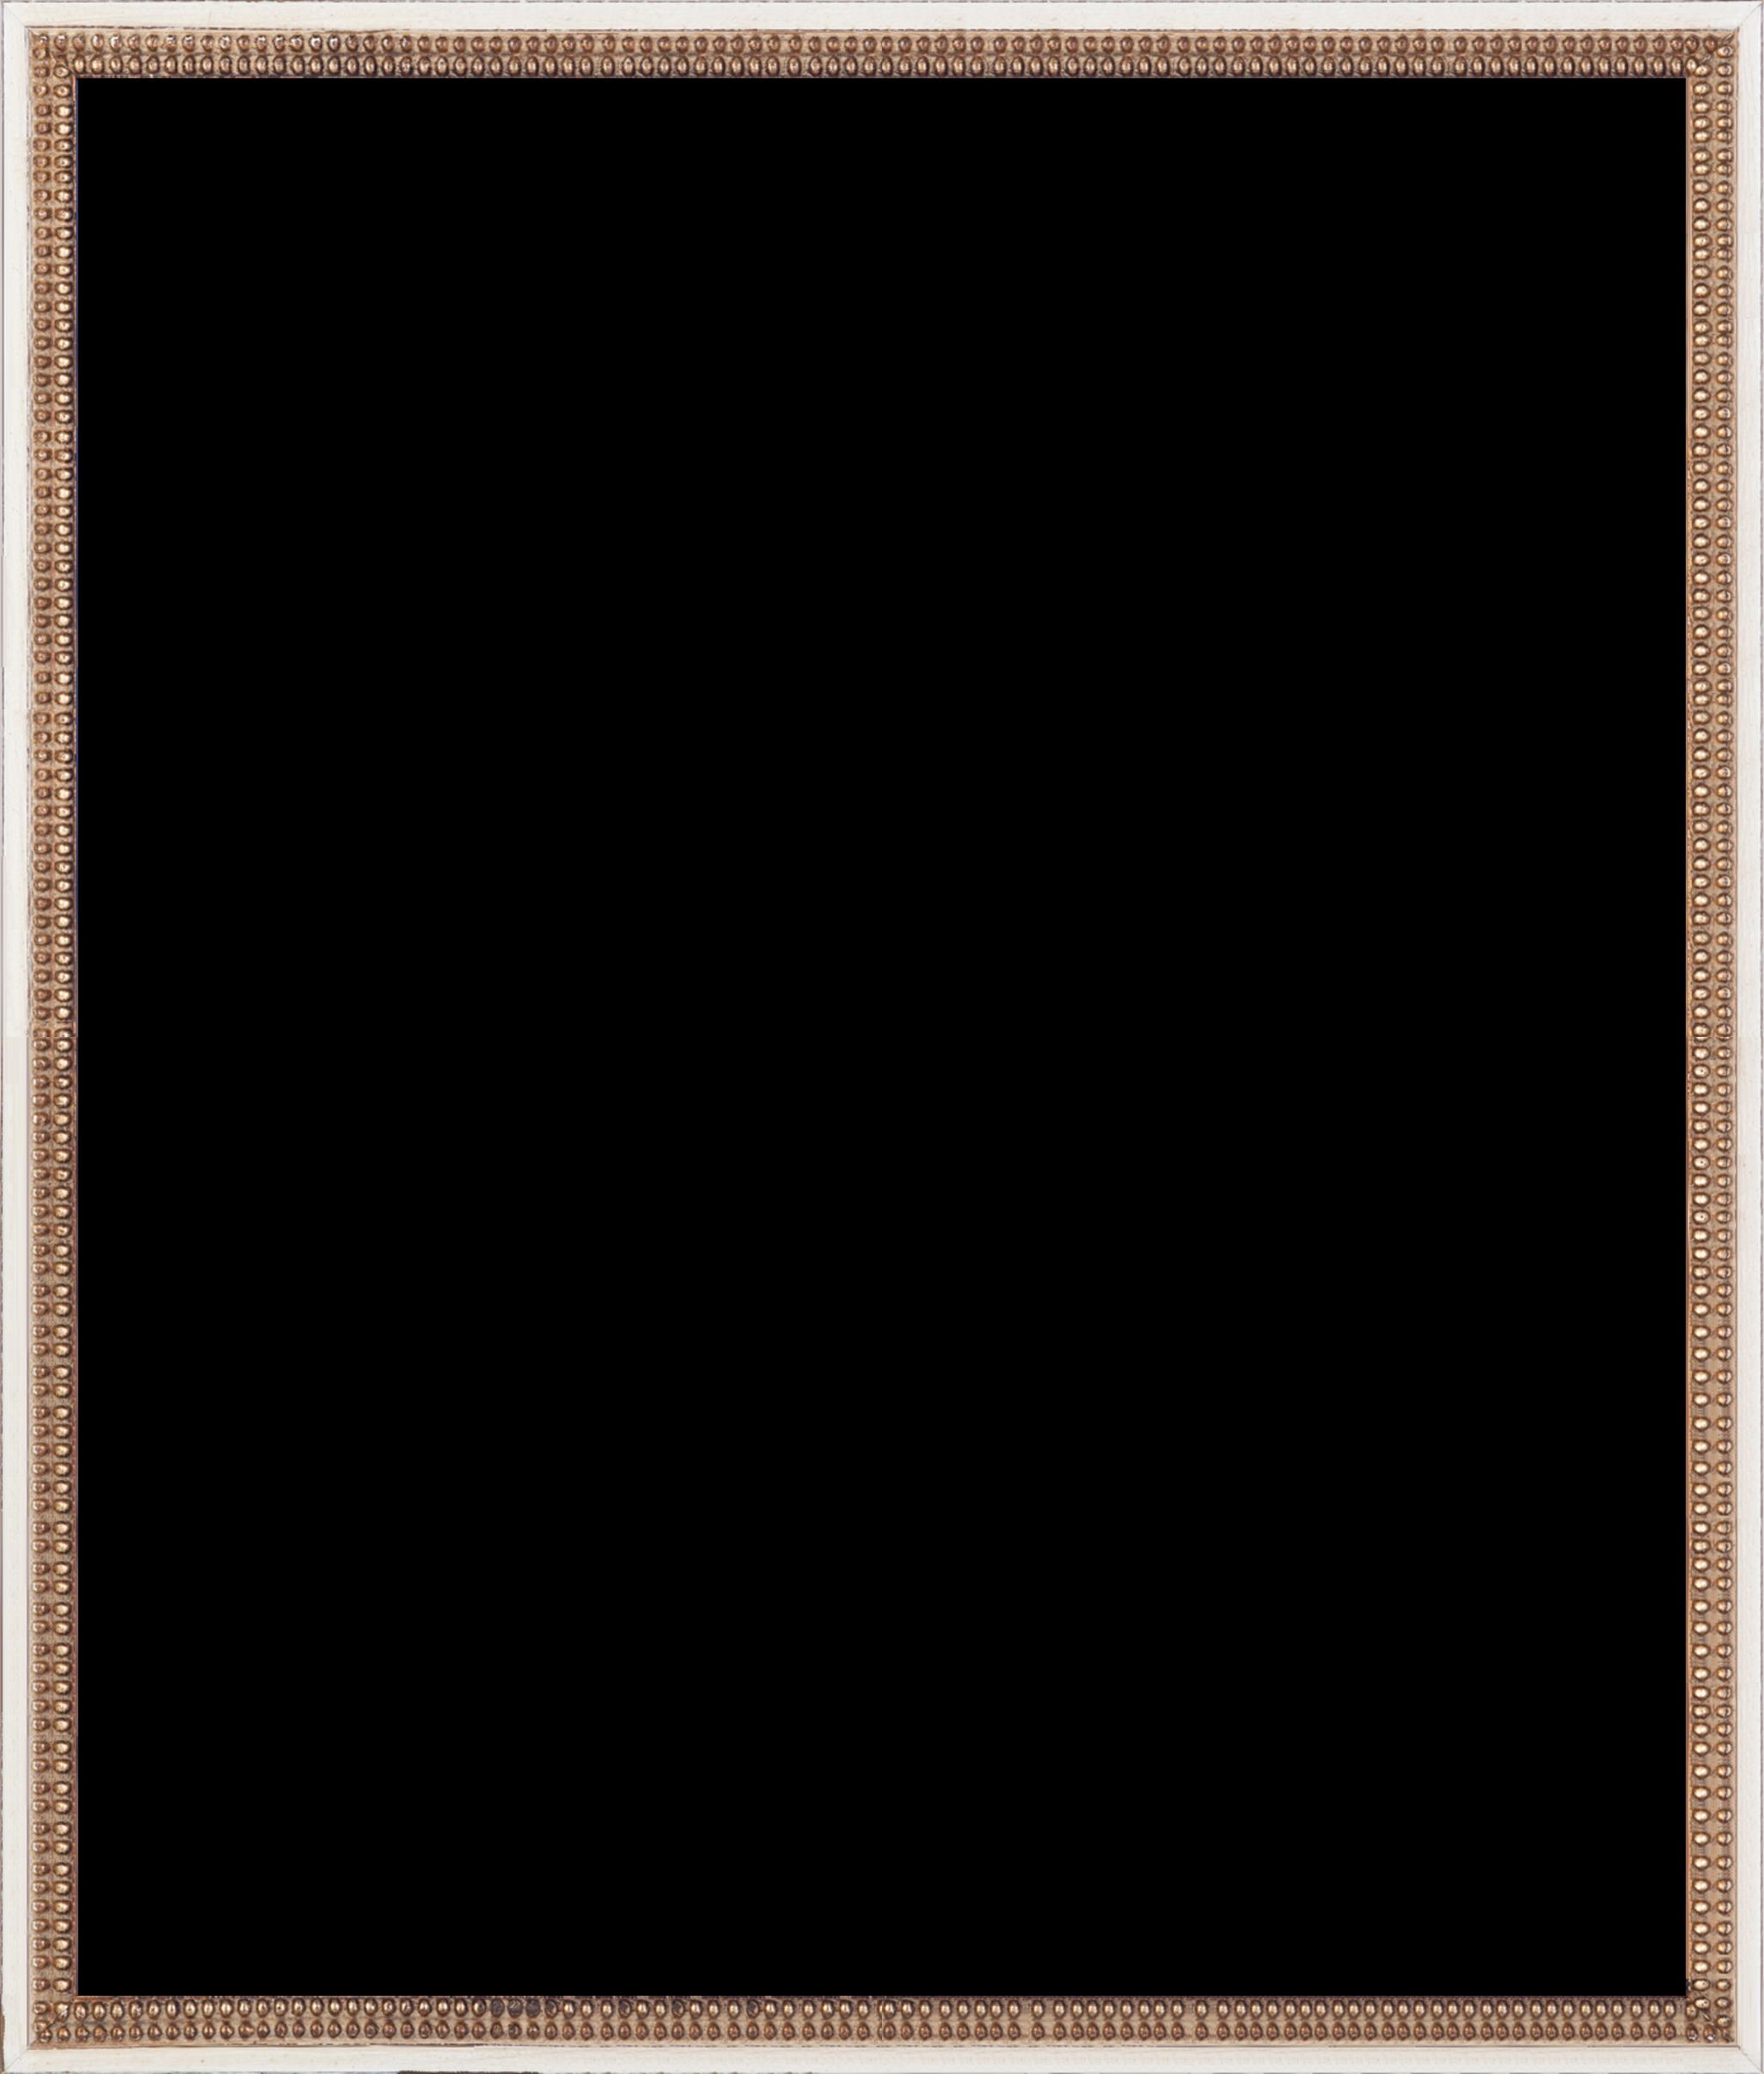 849-1426661752